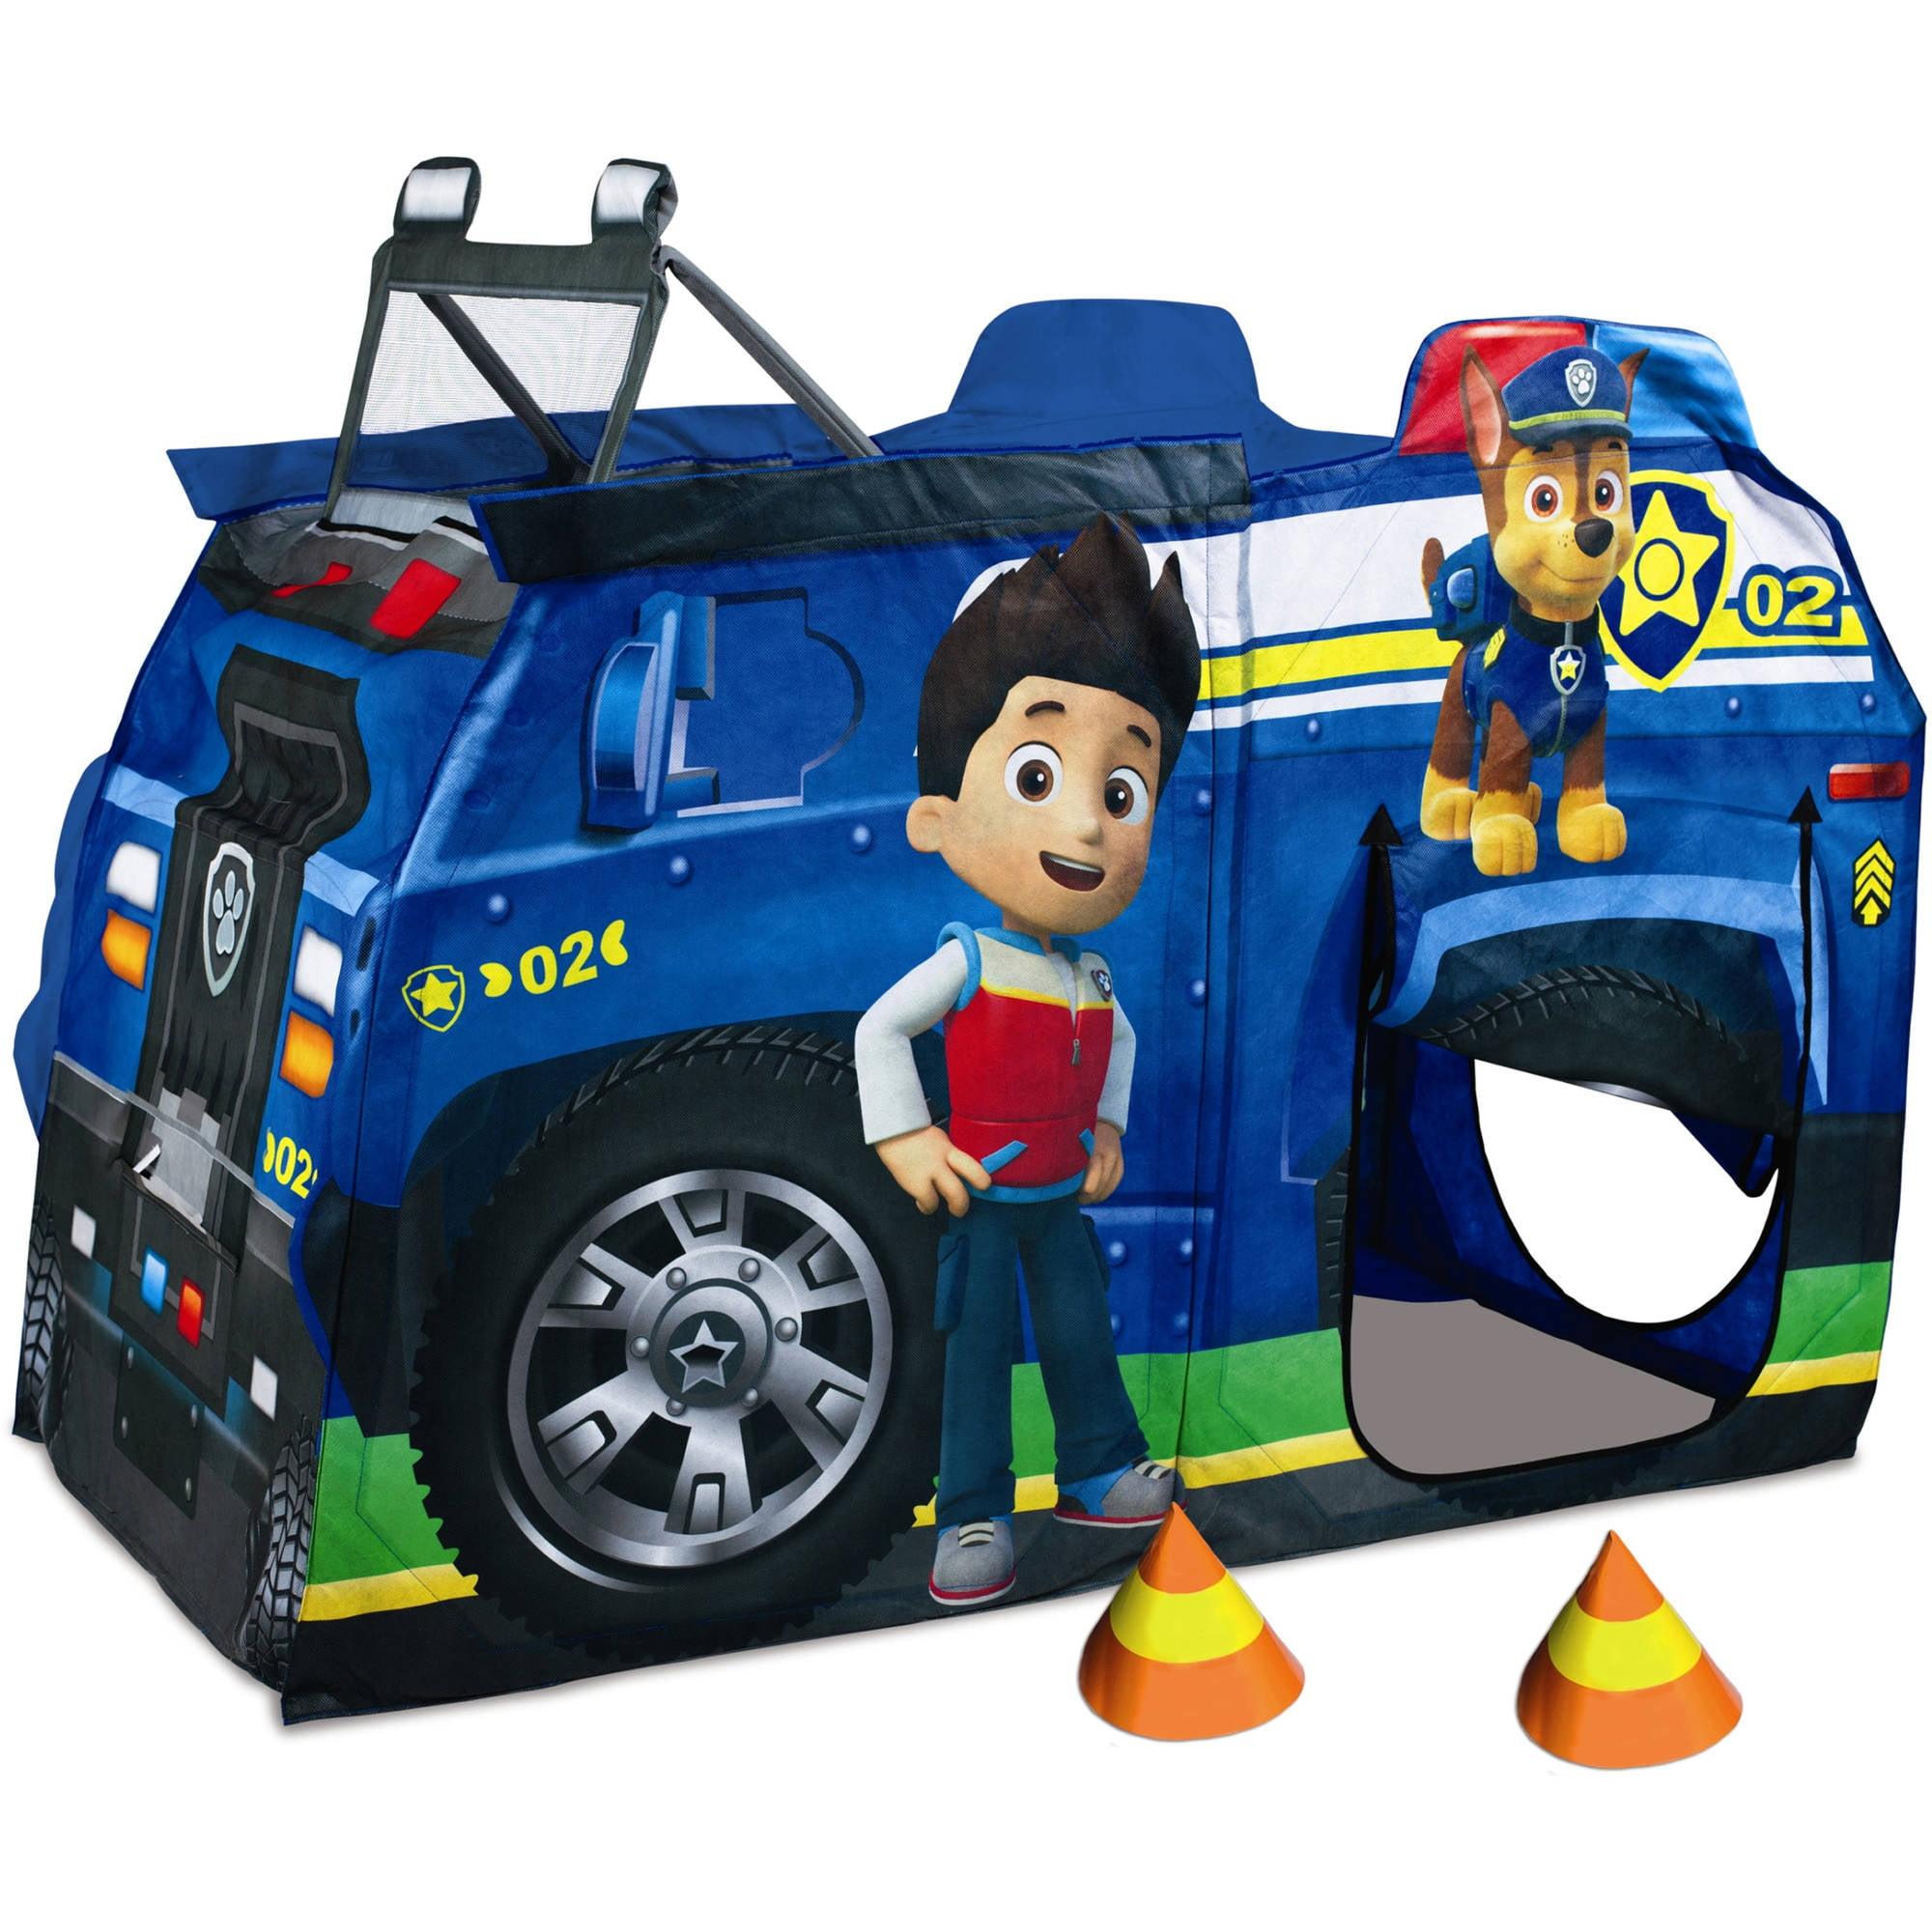 Paw Patrol Chase Police Cruiser Vehicle 51604NK